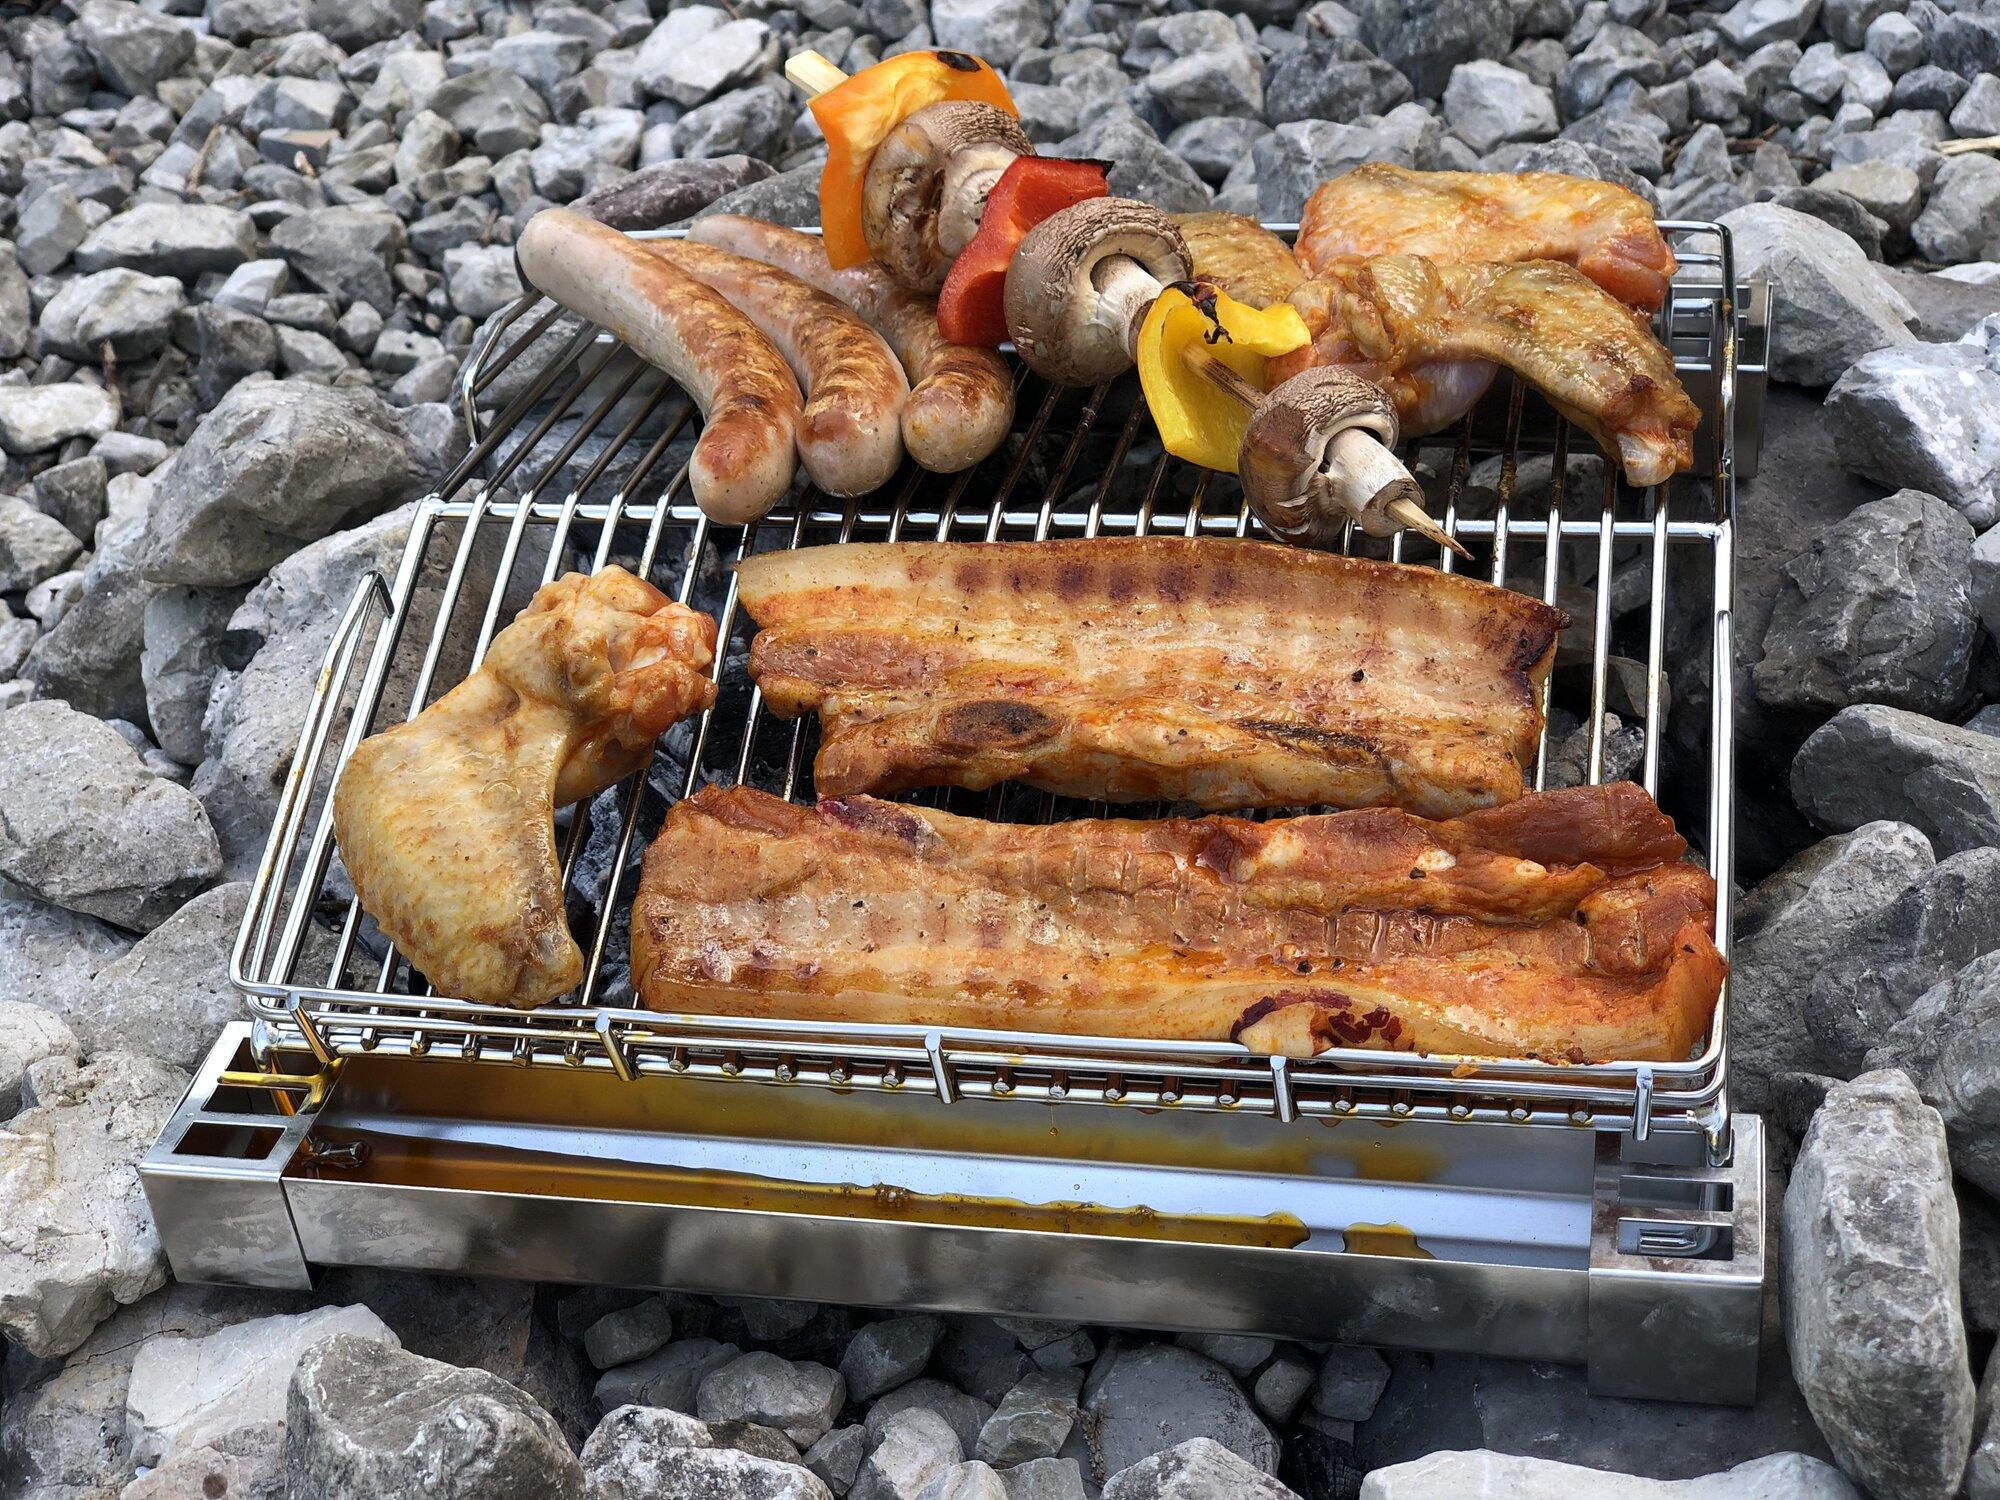 camping grill1.jpeg